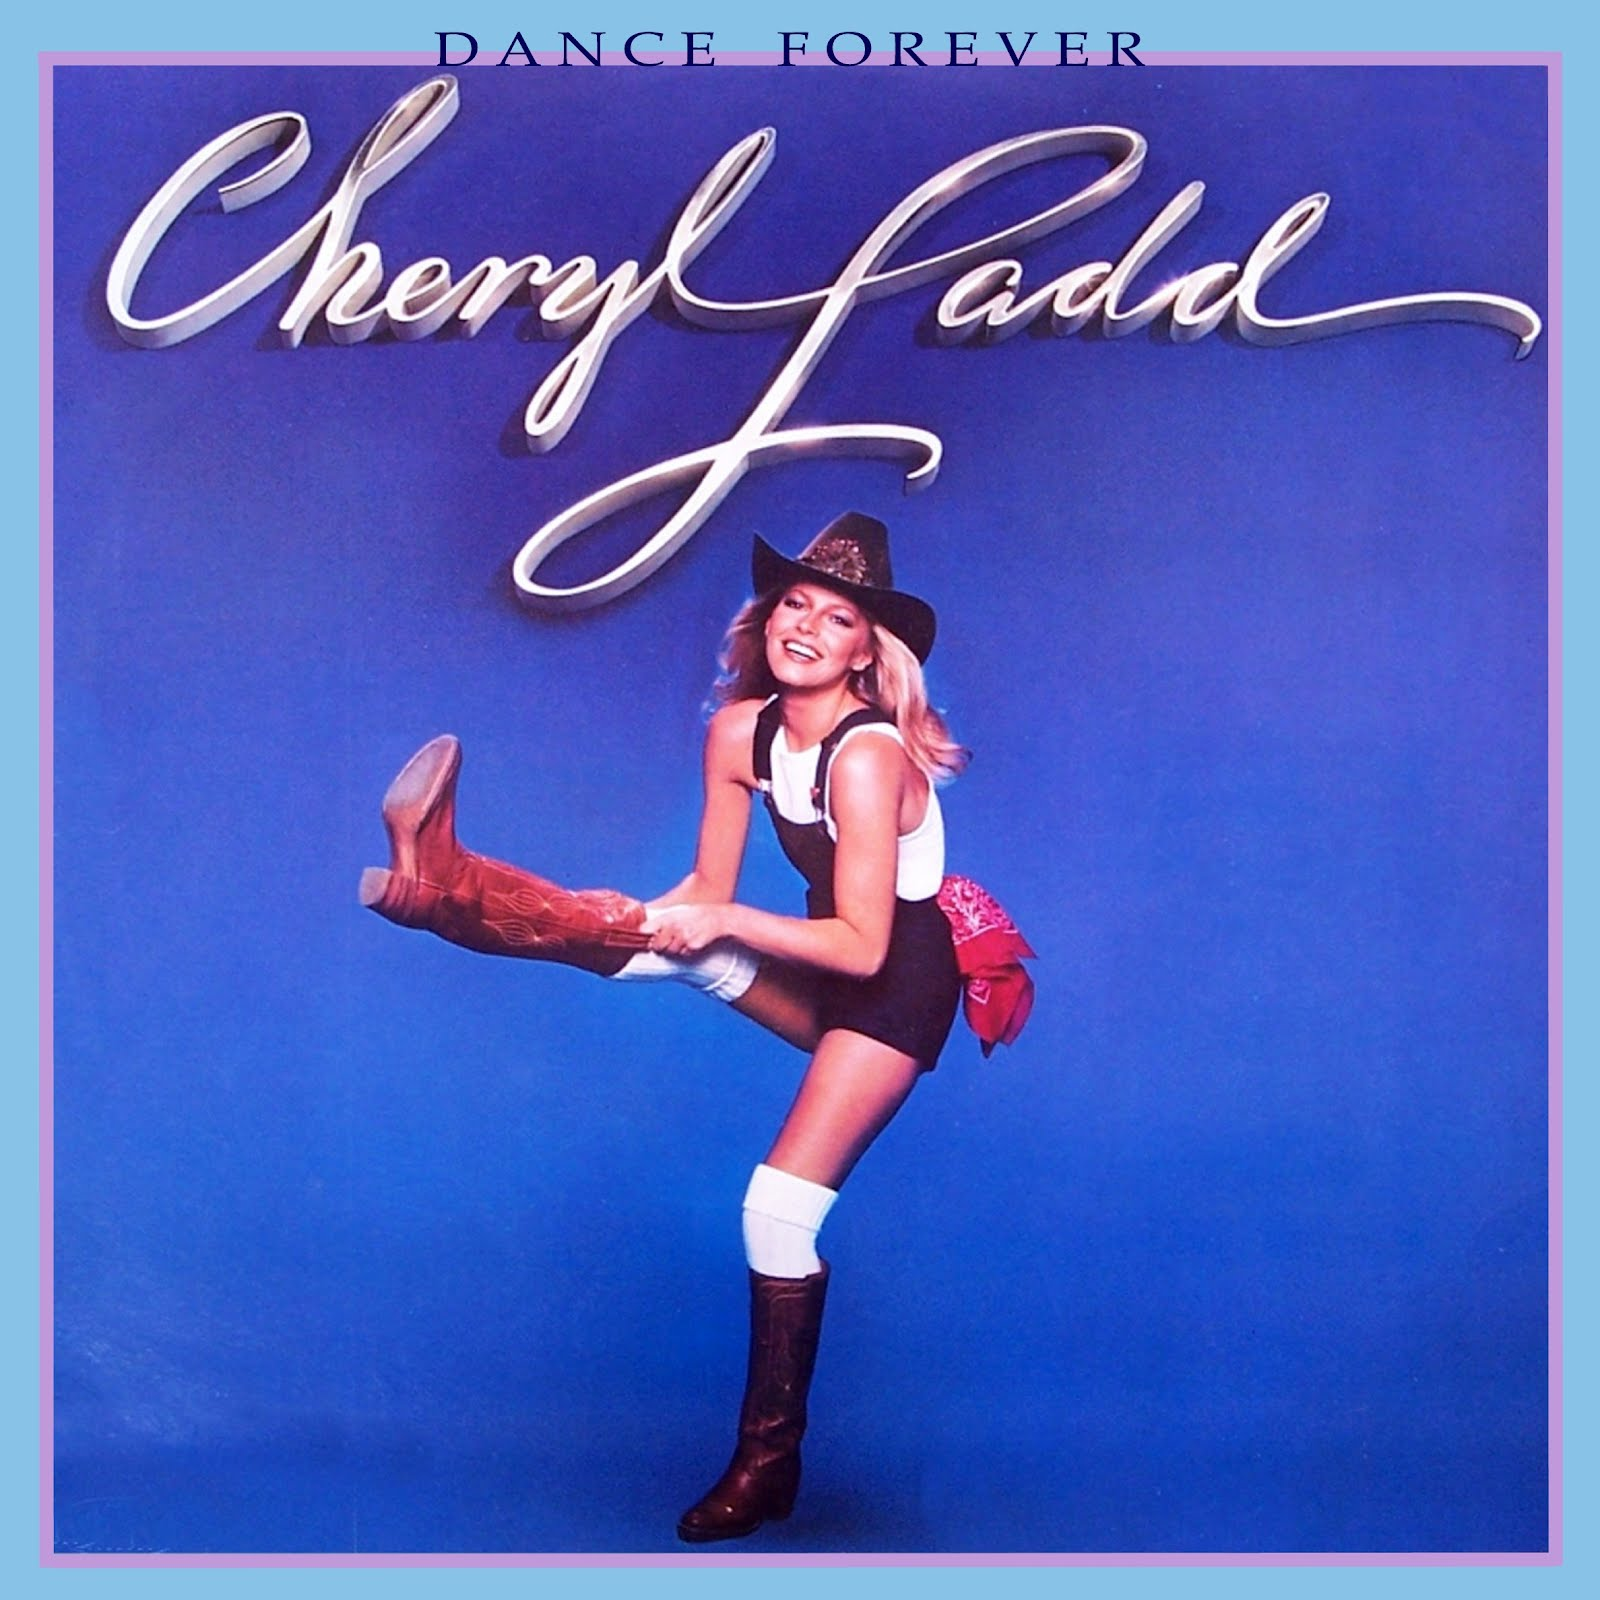 1979 Cheryl Ladd – Dance Forever